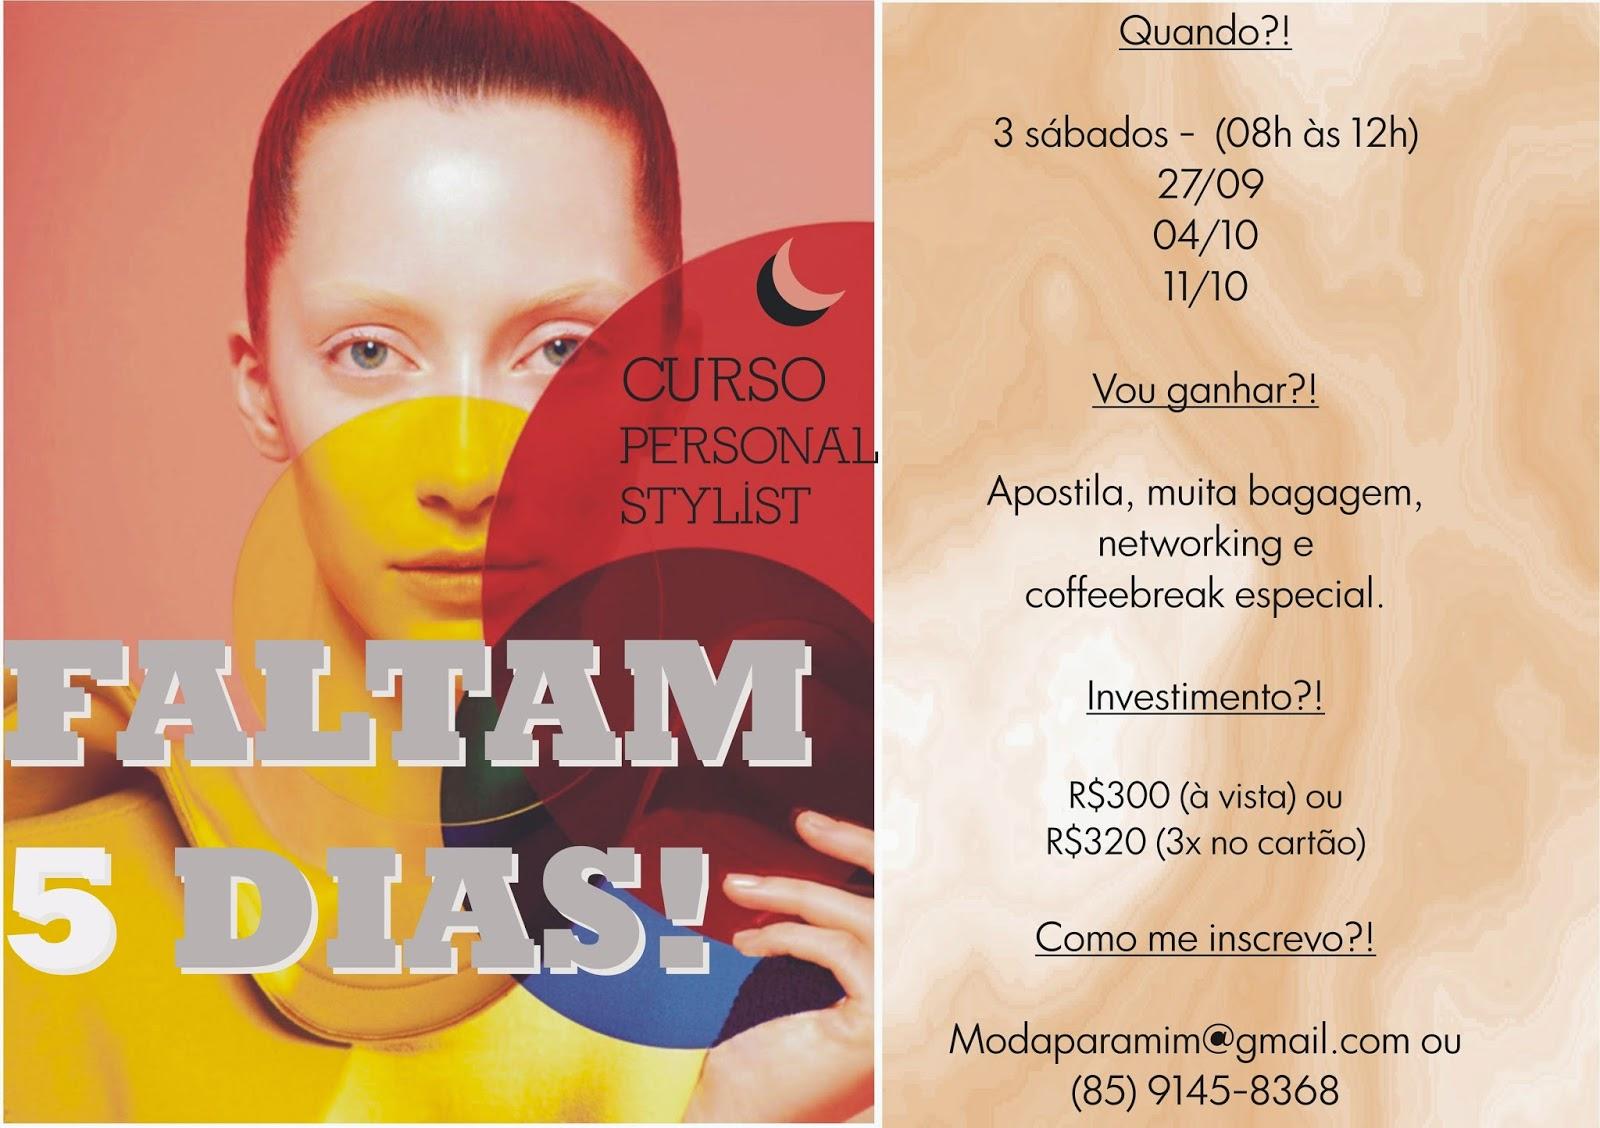 http://www.modaparamim.iluria.com/pd-13325d-curso-personal-stylist-turma-ii.html?ct=&p=1&s=1